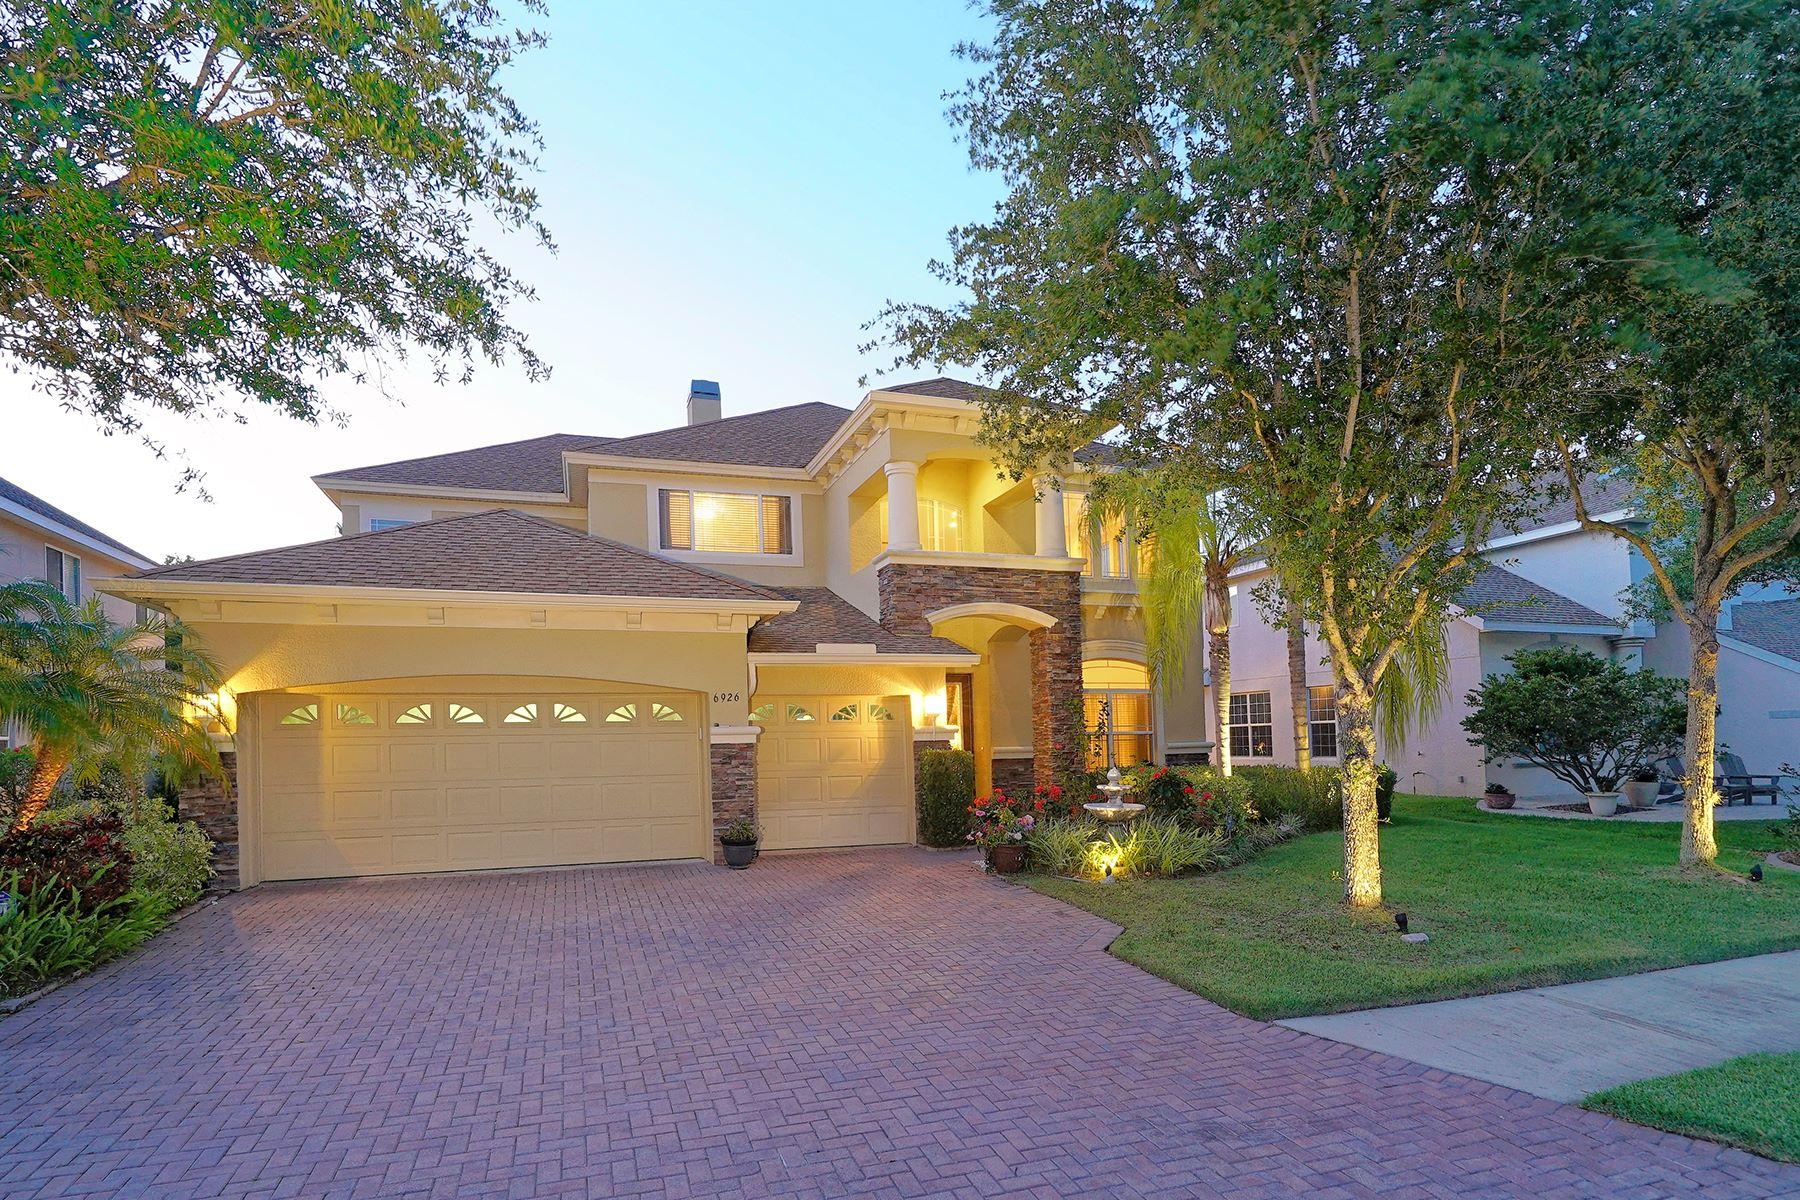 Single Family Home for Sale at OAKLEAF HAMMOCK 6926 40th Ct E Ellenton, Florida 34222 United States